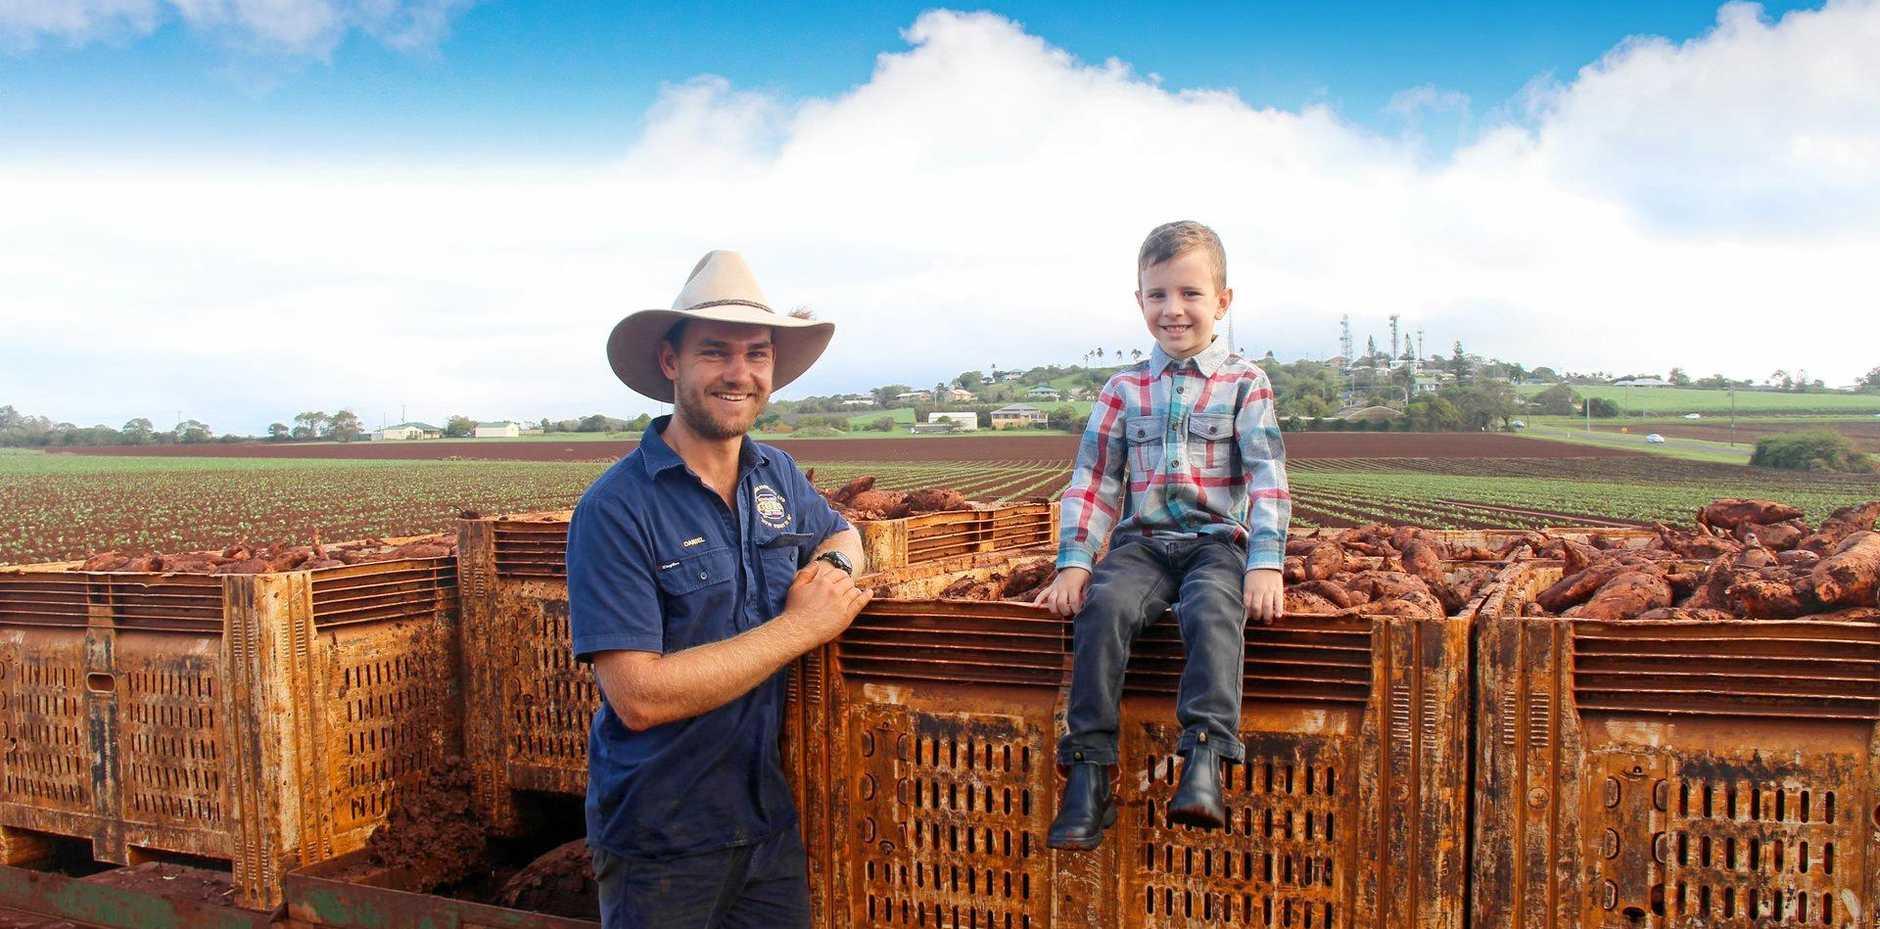 TASTE: Sweet potato farmer Ethan Zunker and five-year-old Jack Tonkin are ready to celebrate at the inaugural Taste Bundaberg Festival.